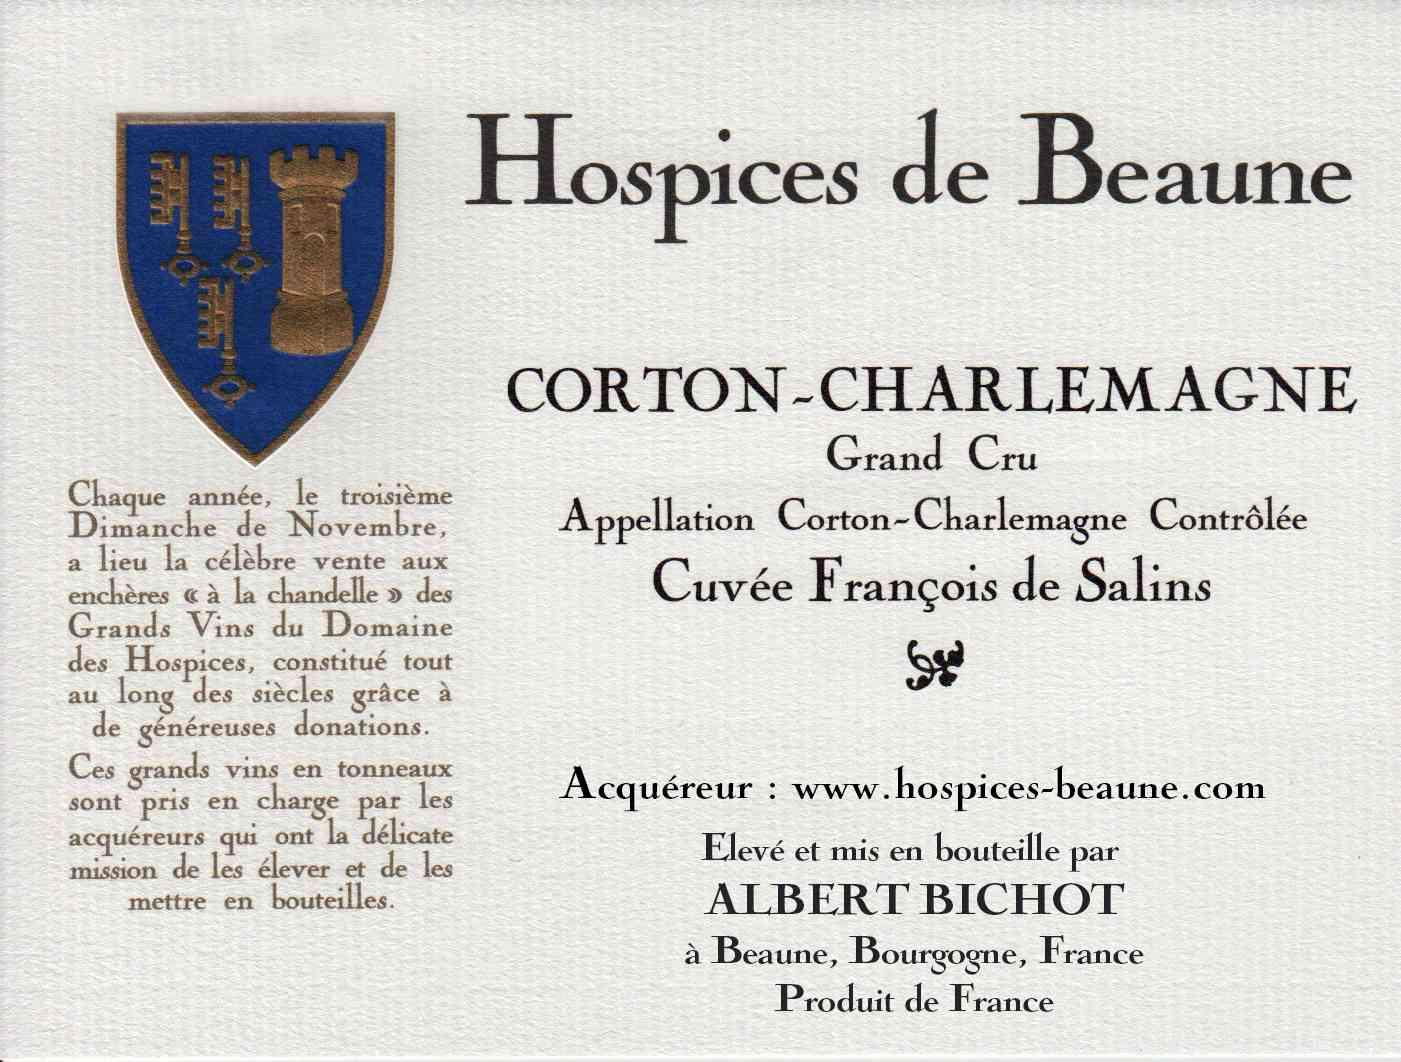 Encheres-auction-HospicesdeBeaune-AlbertBichot-CortonCharlemagne-GrandCru-Cuvee-FrançoisdeSalins